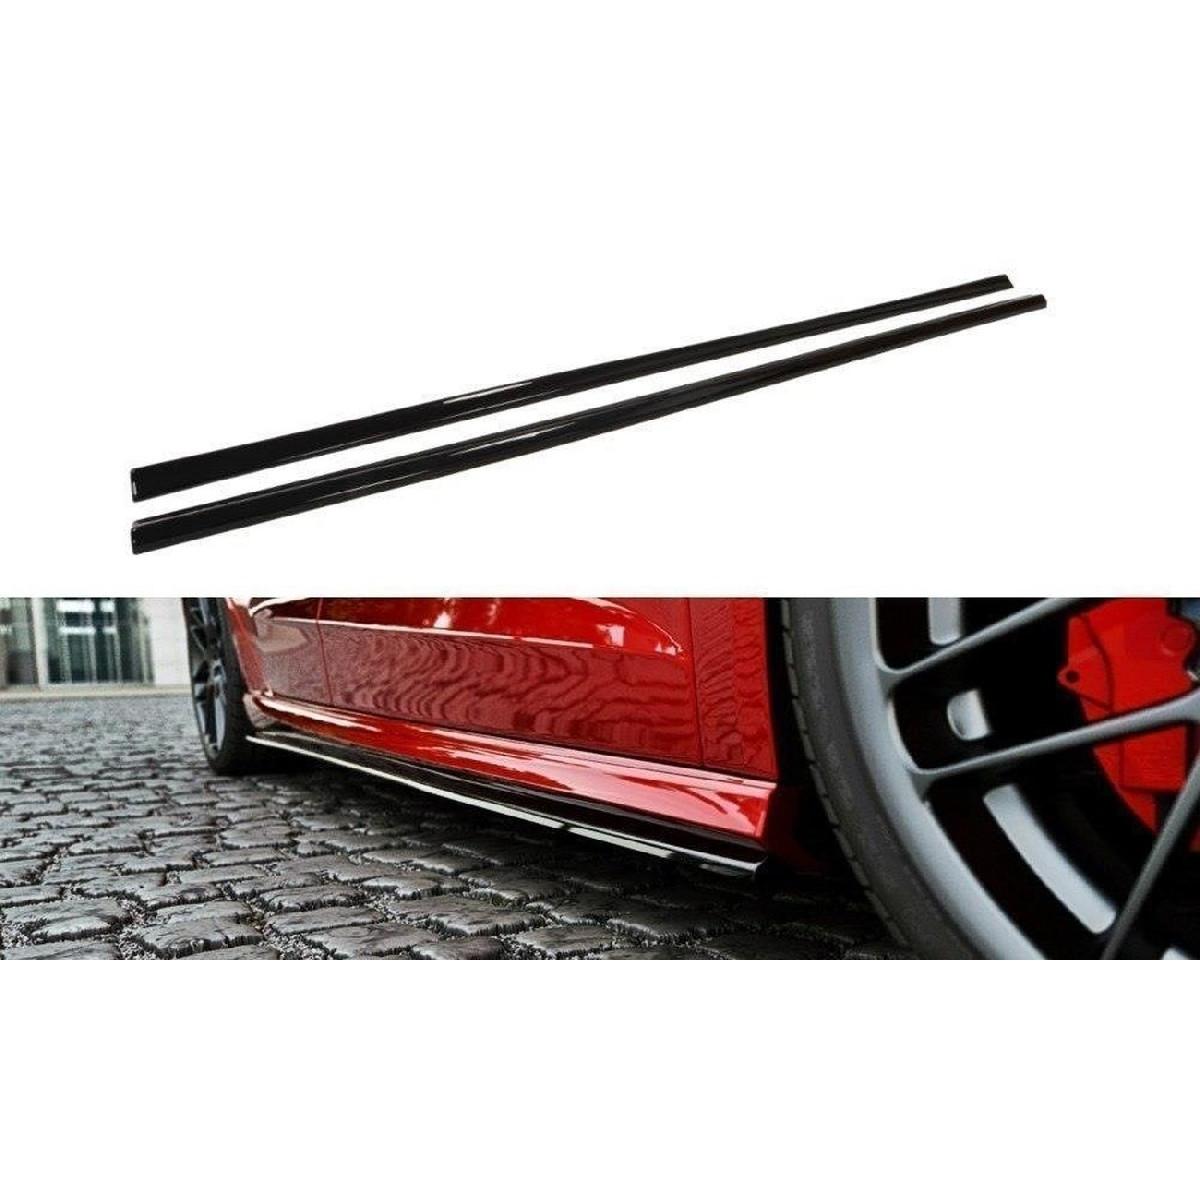 Seitenschweller Ansatz Cup Leisten für Audi S3 / A3 S-Line 8V / 8V FL Sportback schwarz matt